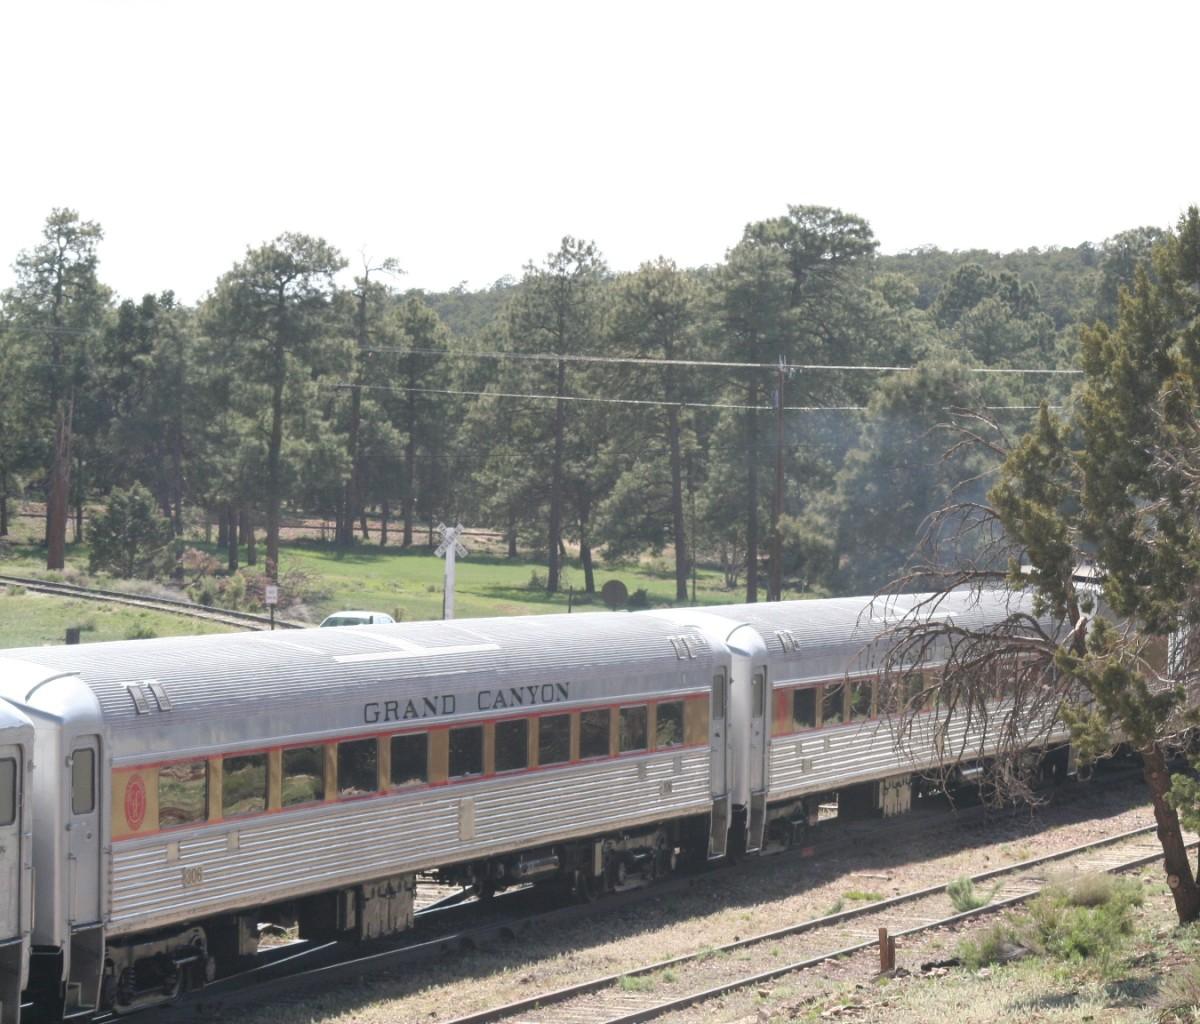 Grand Canyon Railroad Passenger Cars